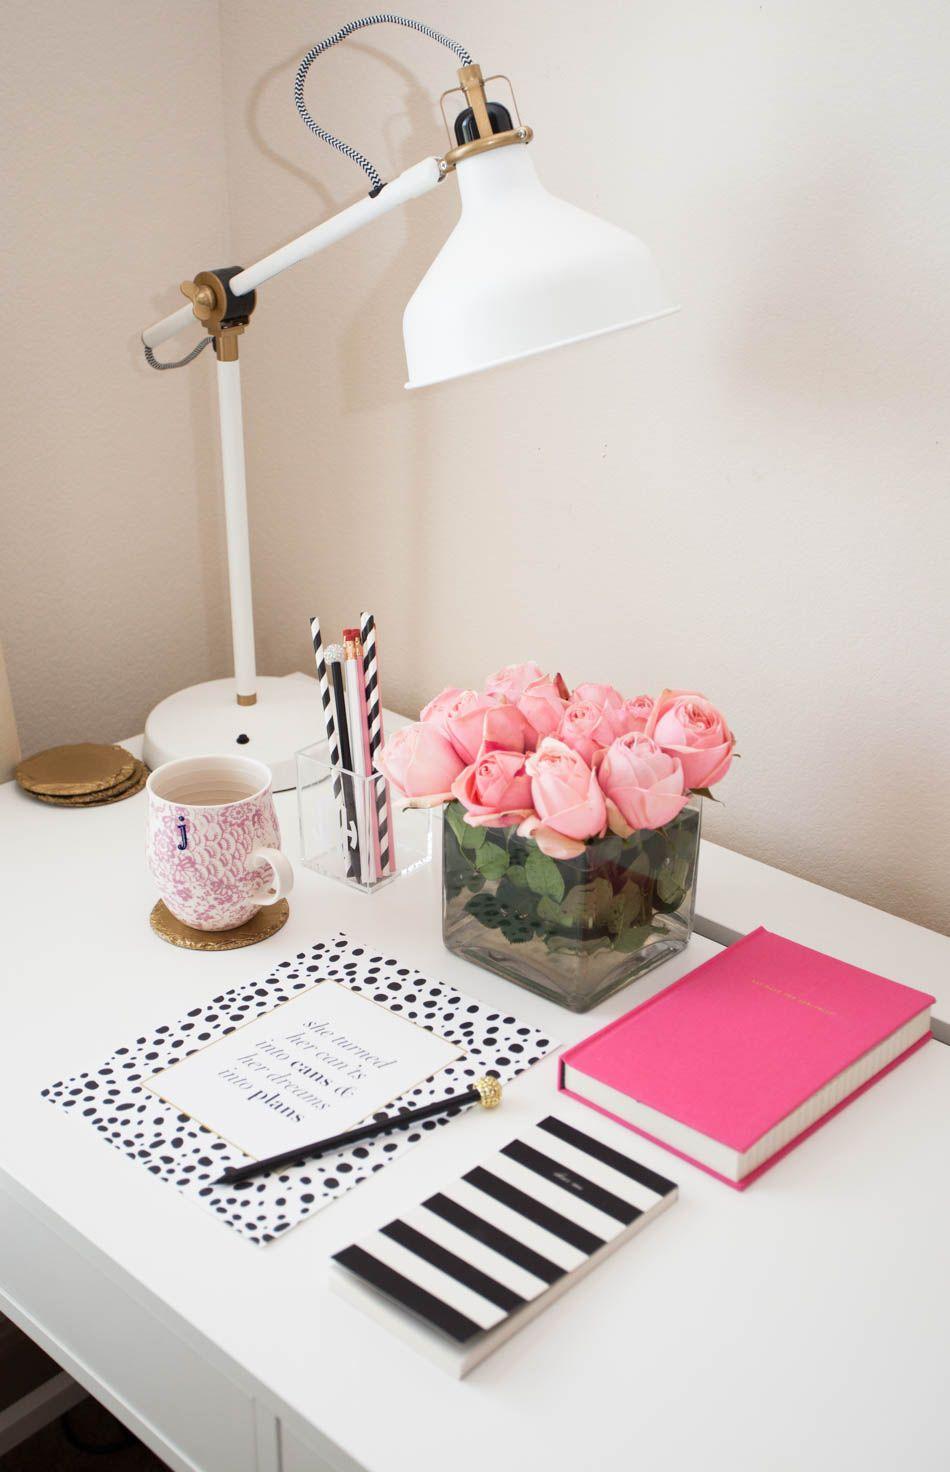 The Room Pretty office supplies, Decor, Home office decor